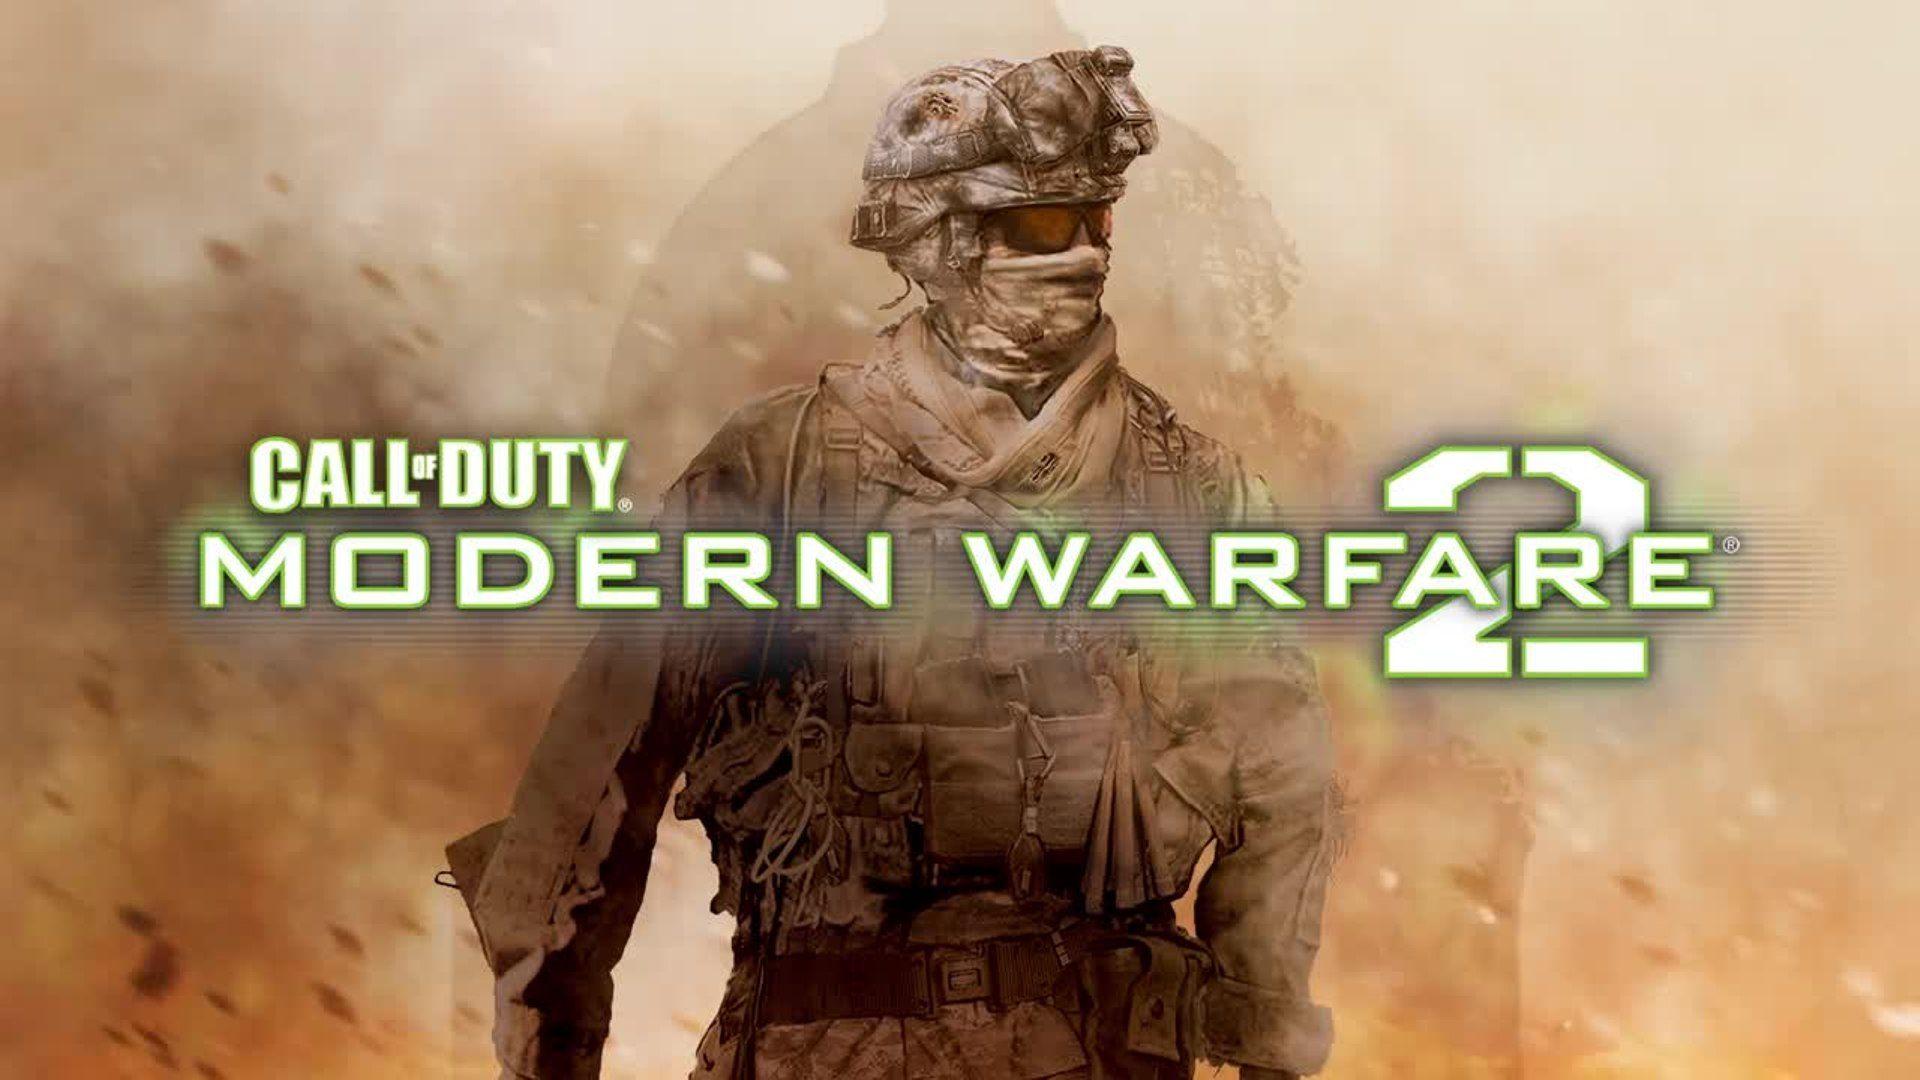 call of duty modern warfare 2 remastered geliyor shiftdelete oyun haberleri